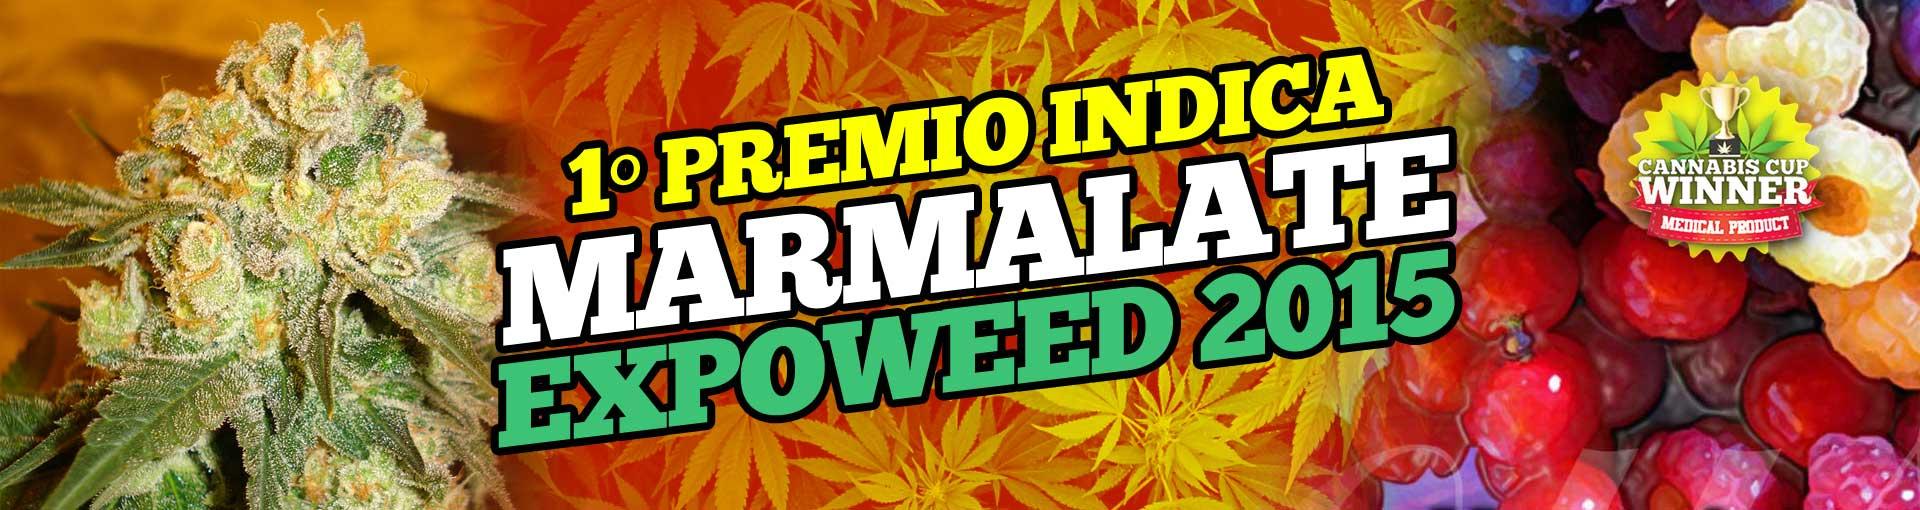 Marmalate Promo